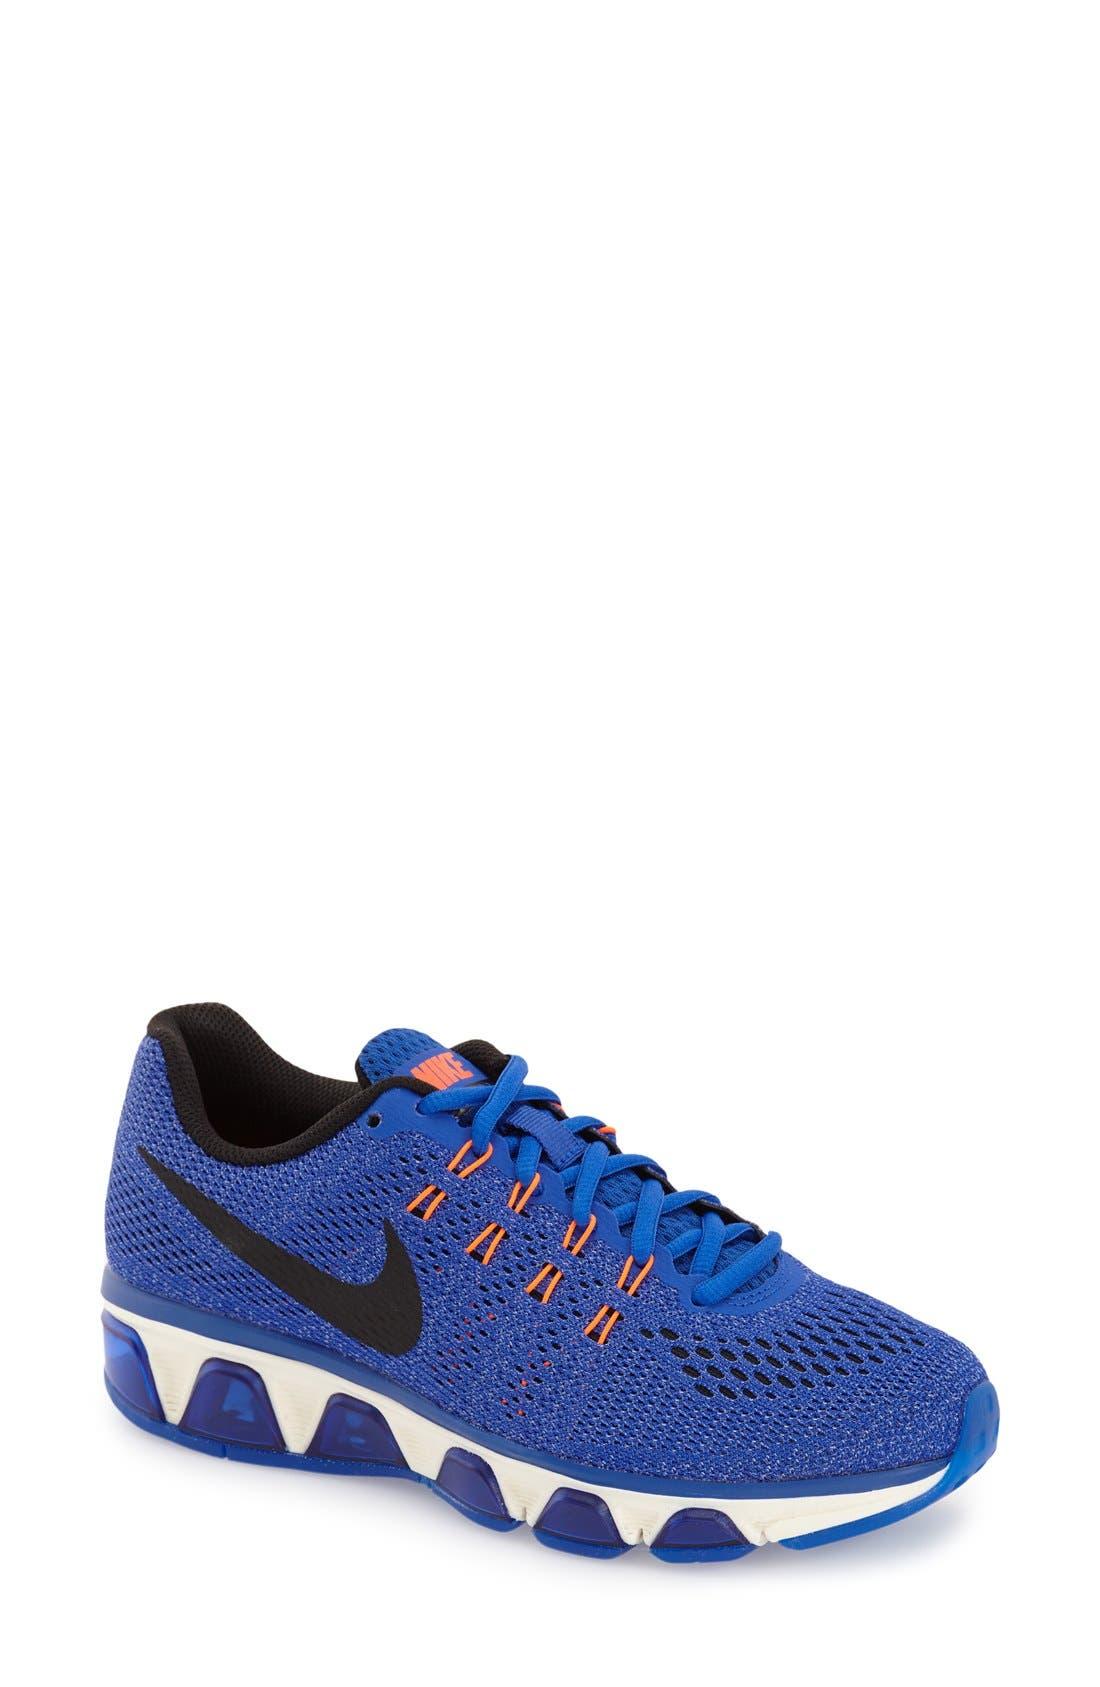 Nike Air Max Tailwind 8 Running Shoe Women Nordstrom